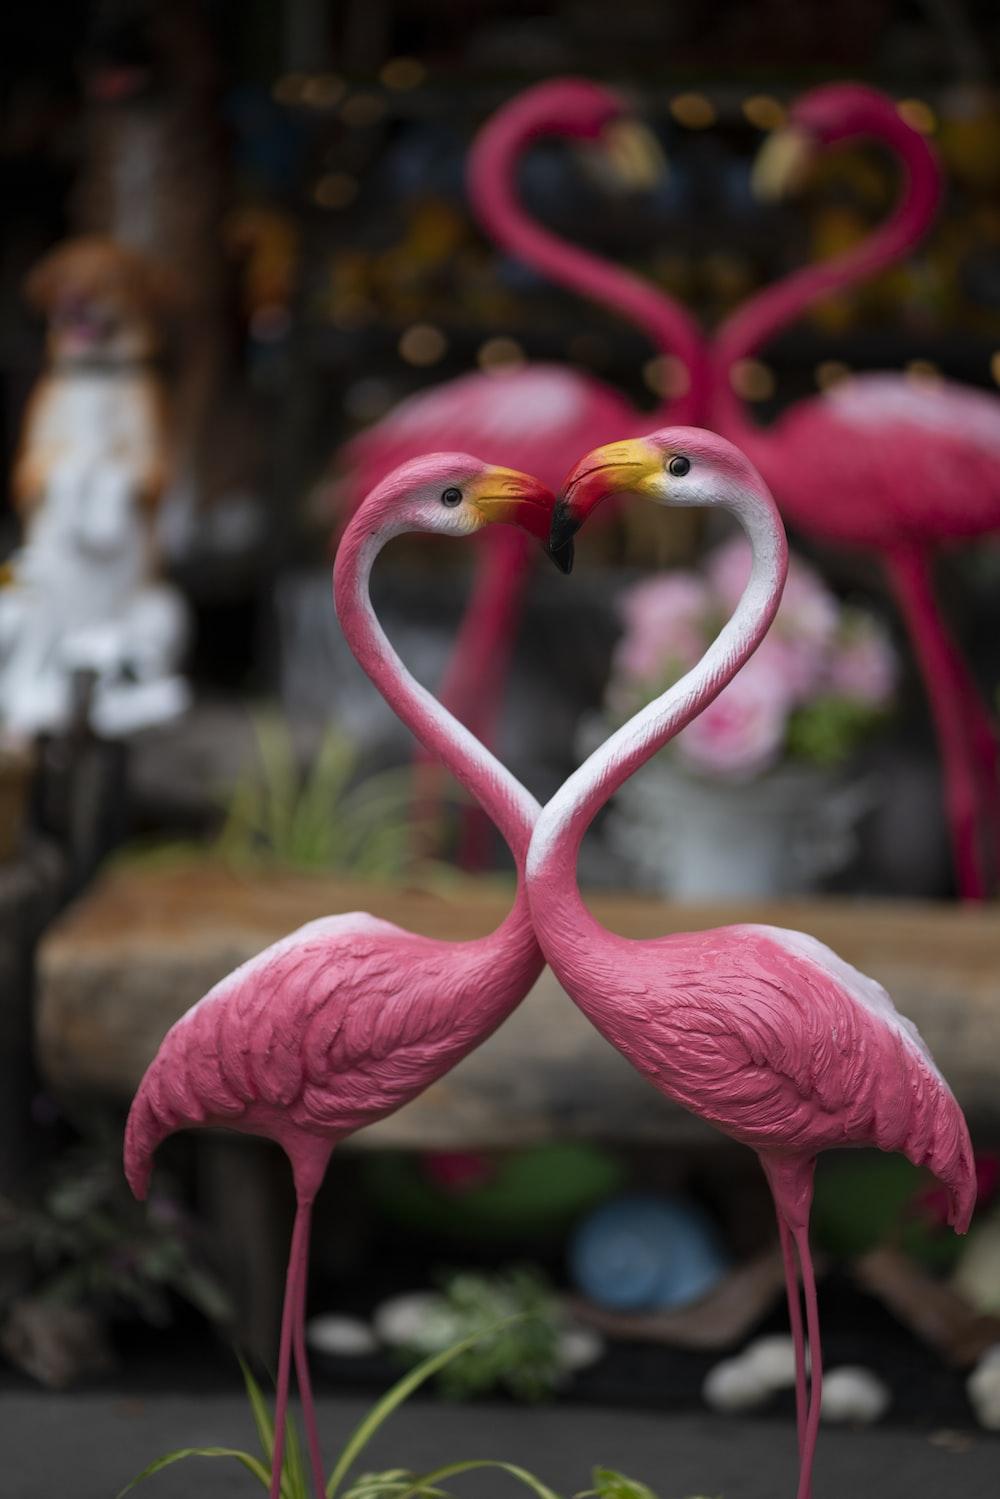 Love Birds Pictures Download Free Images On Unsplash